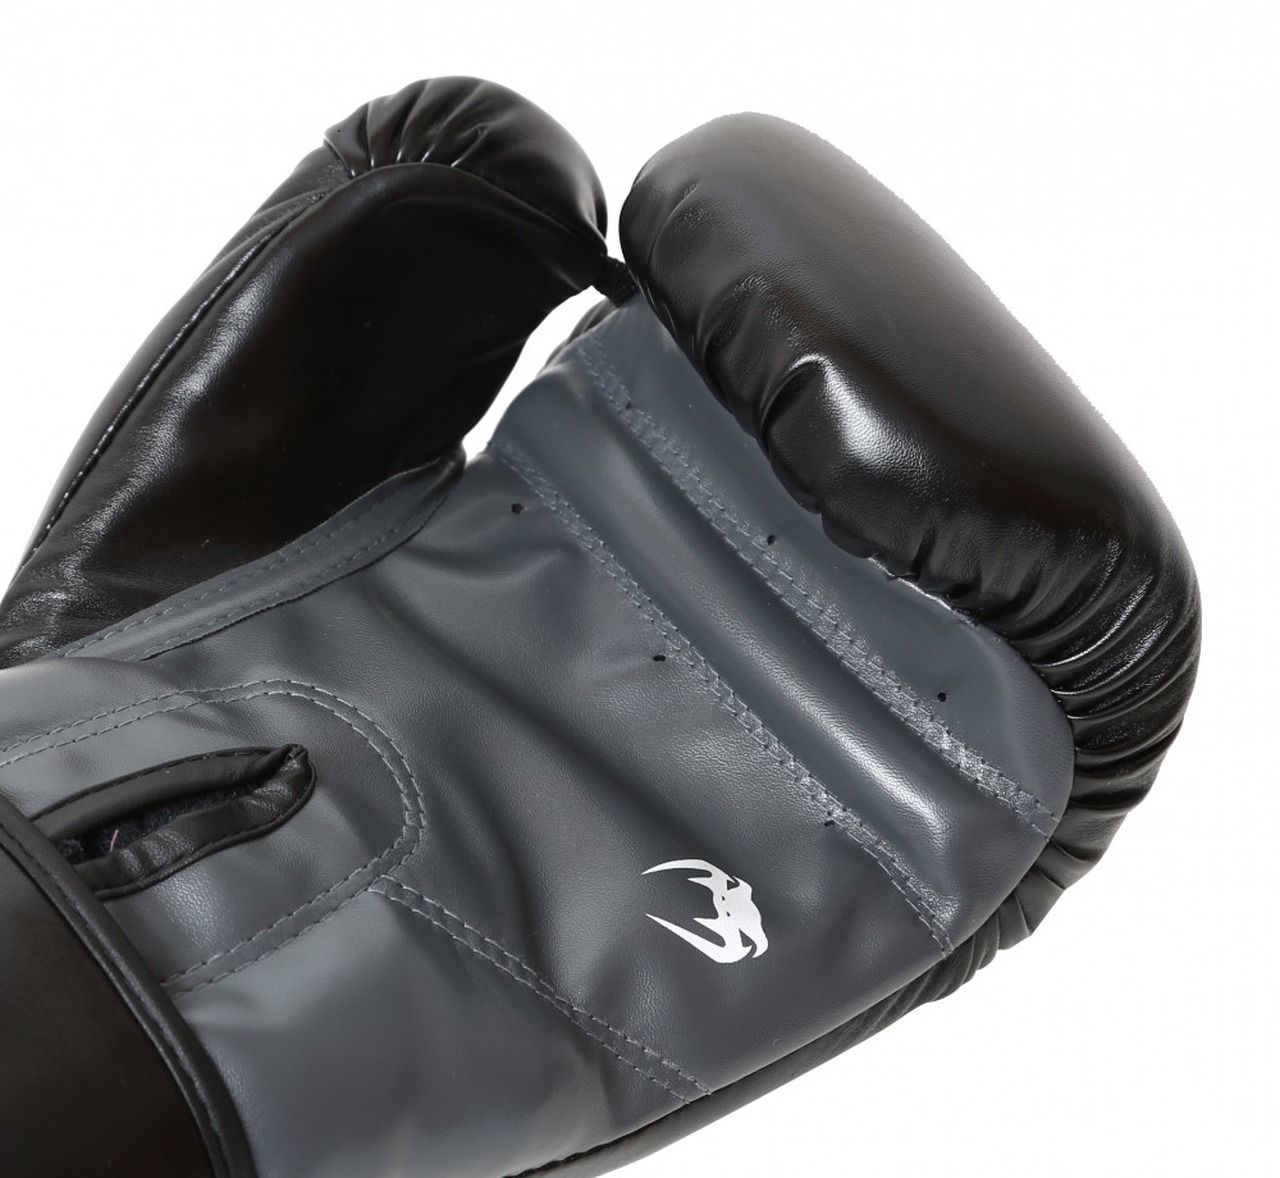 Luva de Boxe / Muay Thai 14oz - Preto - New Contender - Venum  - PRALUTA SHOP